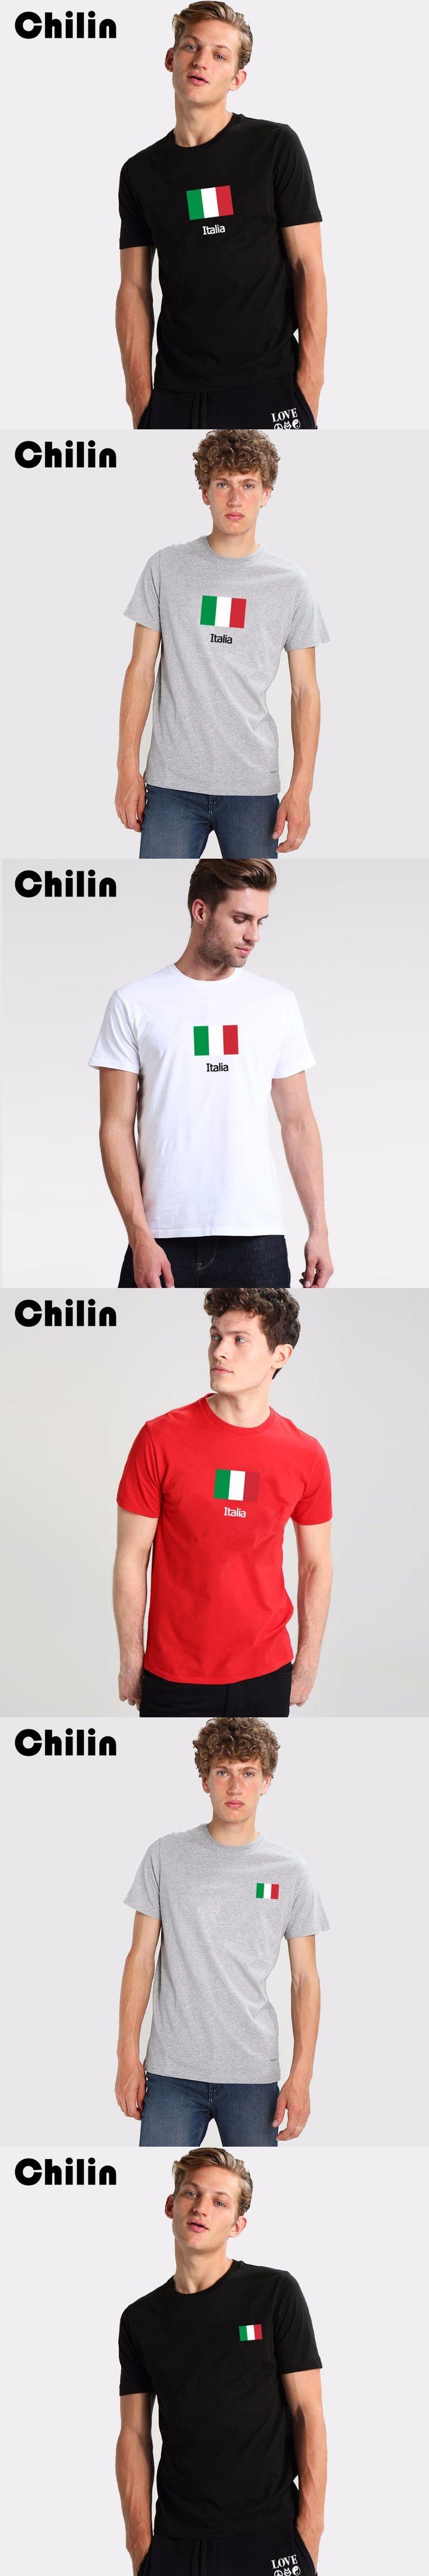 Chilin flag italy t shirt Men Short Sleeve Round Neck T-Shirt Mens Custom Made Plus Size Tees Shirt Cheap tshirt Tops Clothes